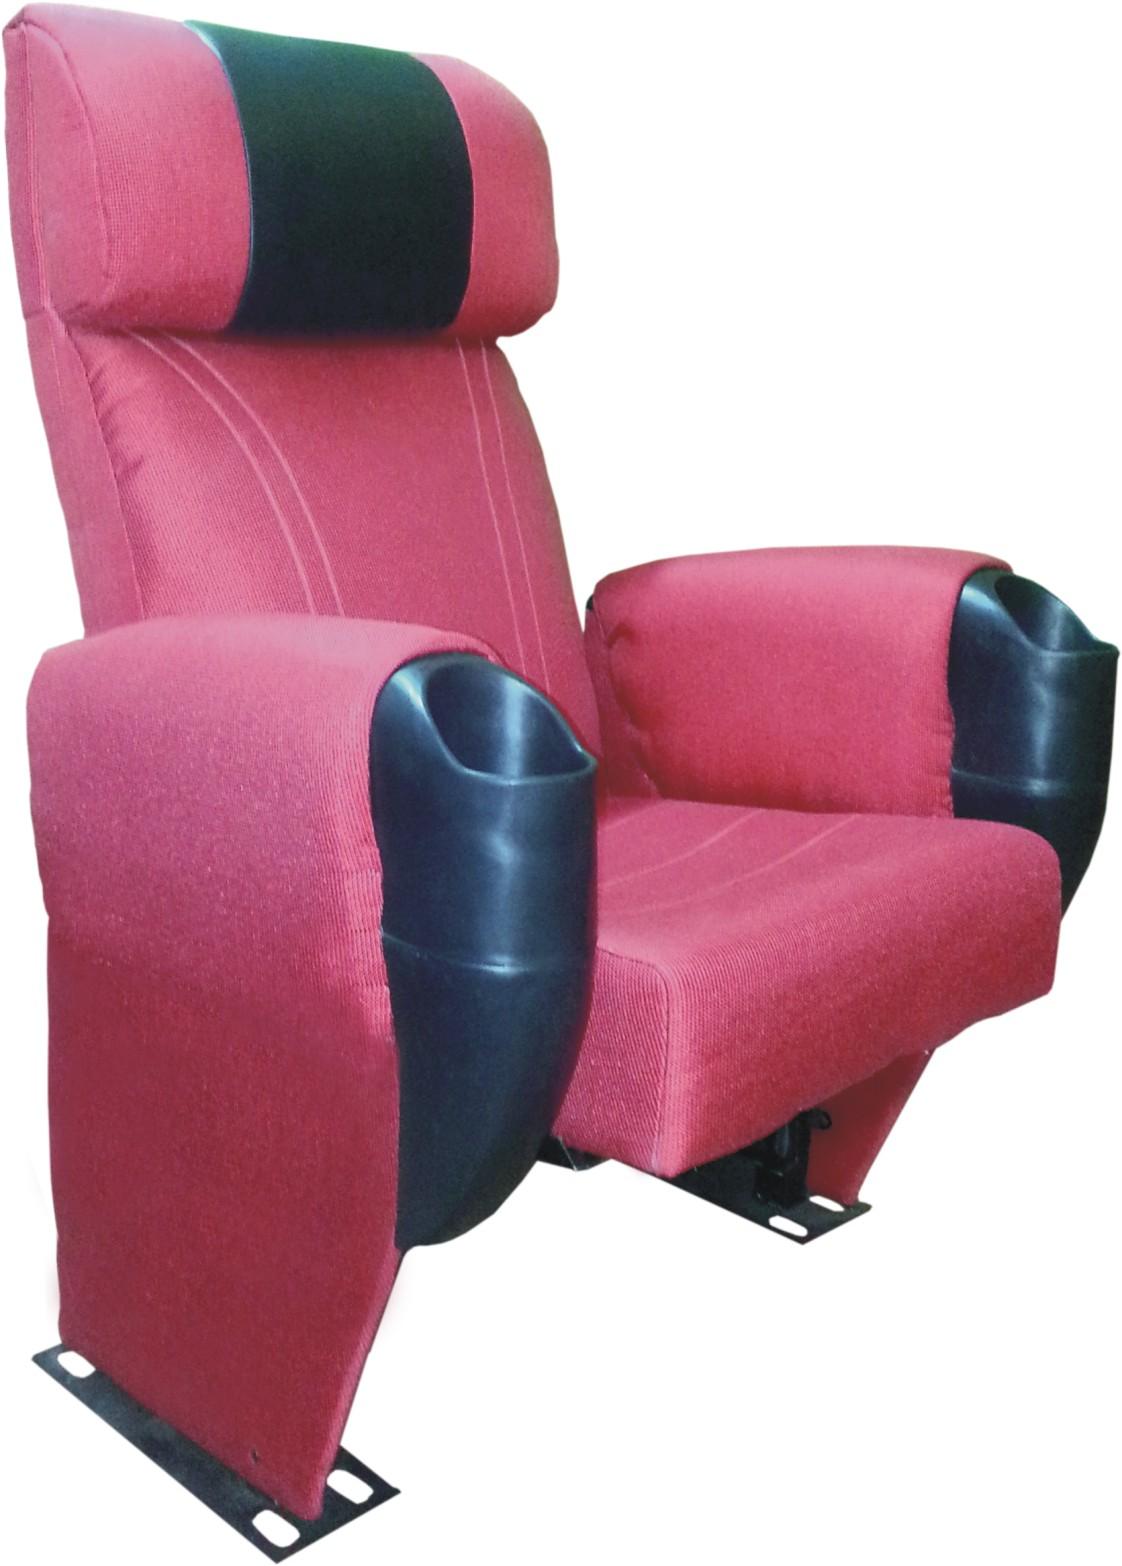 Auditorium Series chair manufacturer in patna   Spark International is the best Auditorium Series chair manufacturer in patna